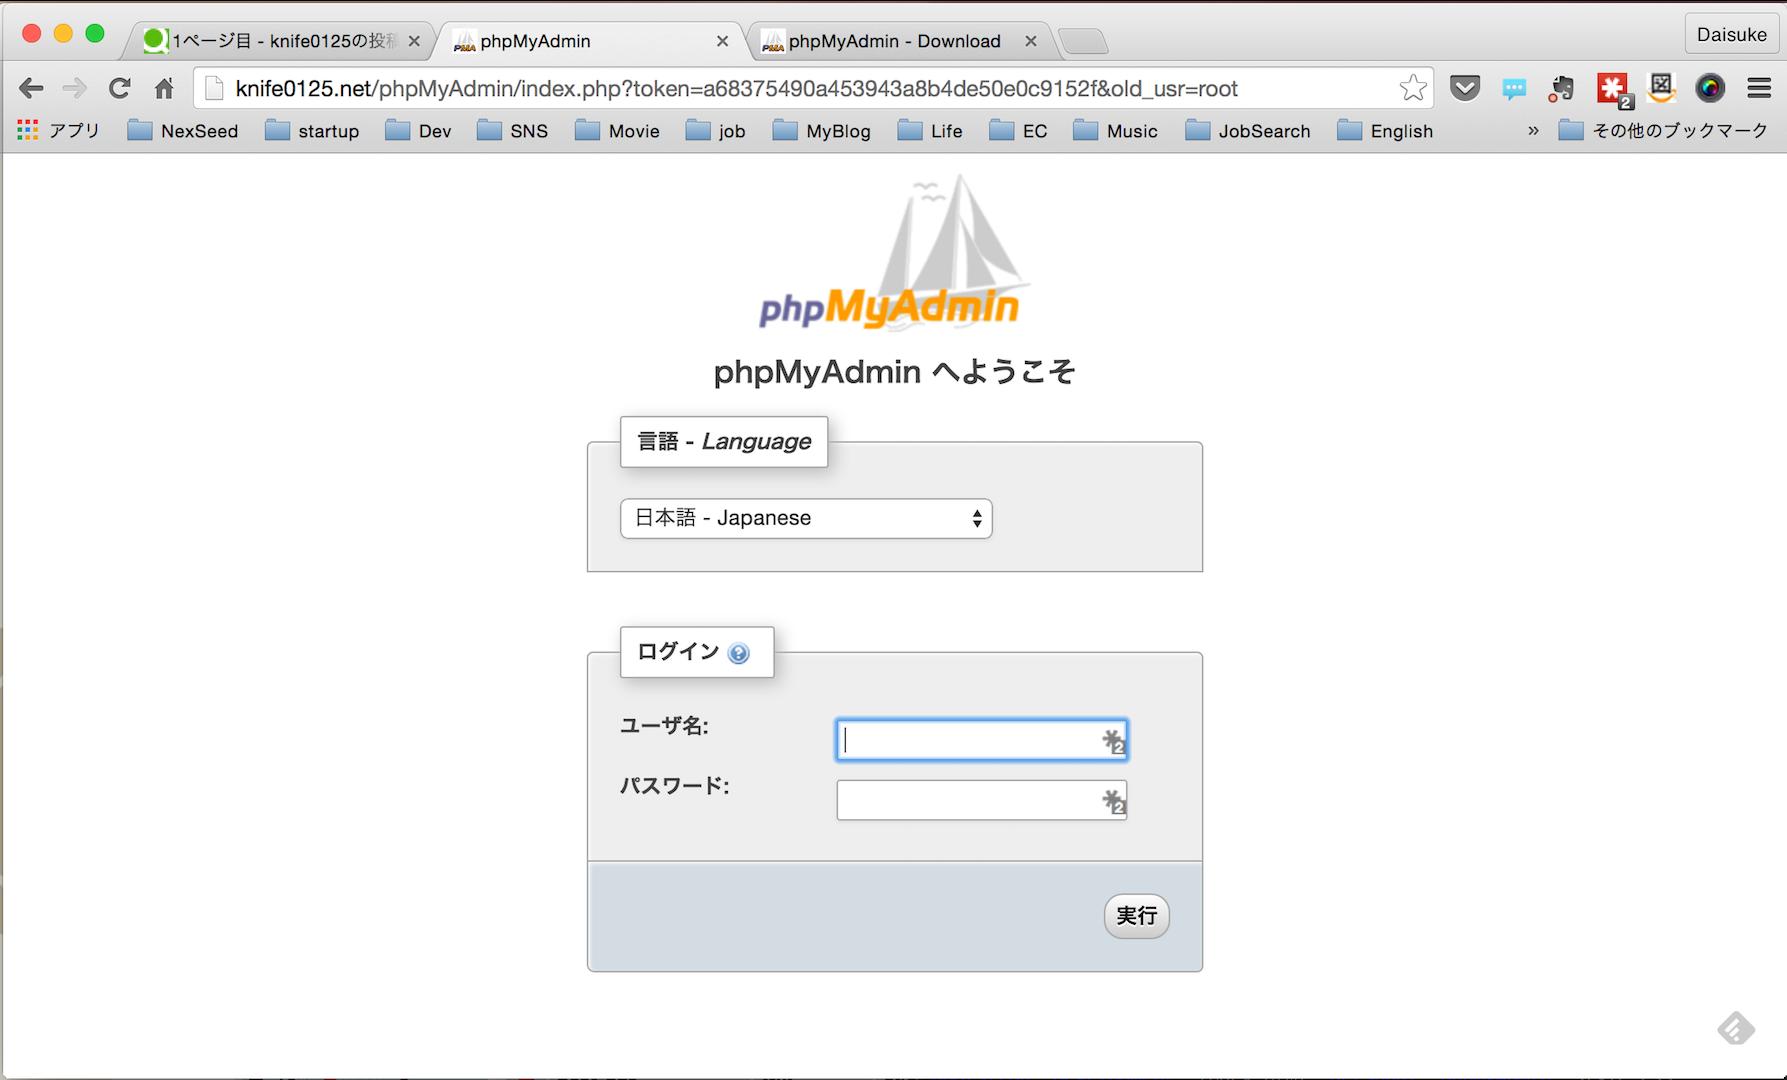 PHPMyAdmin_Export_01.png